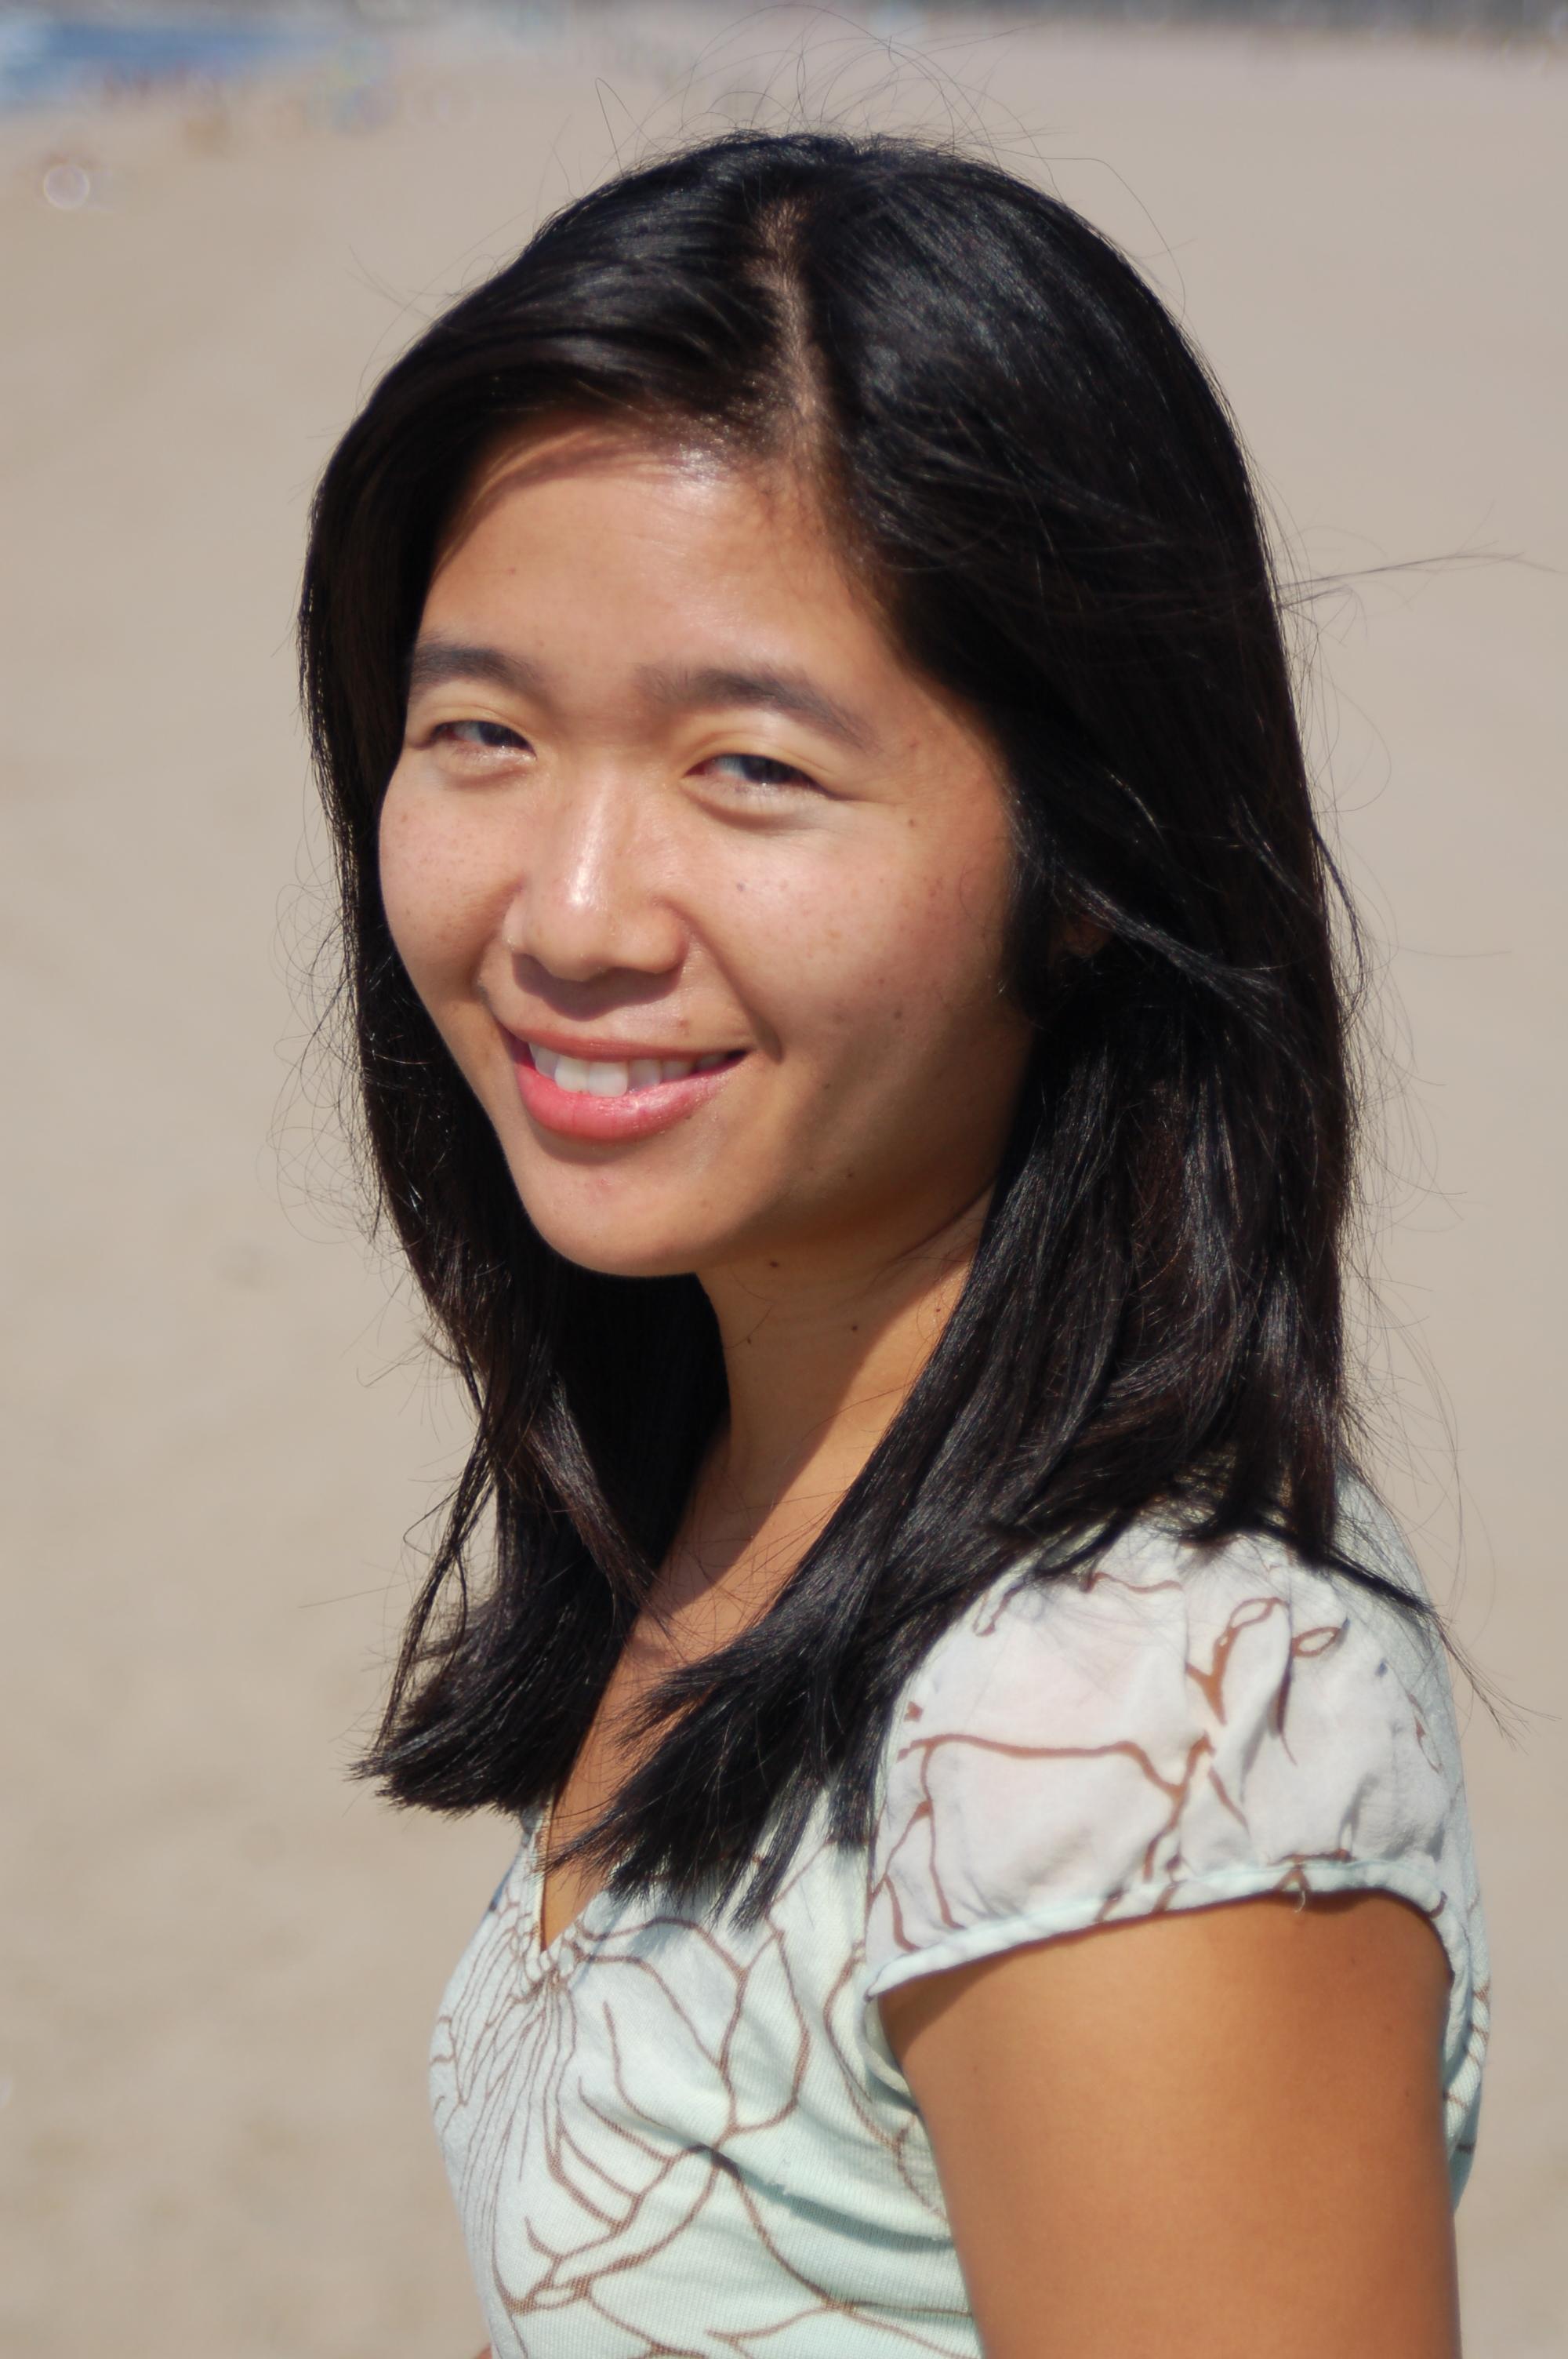 Visit Vanessa Hua's website at  vanessahua.com